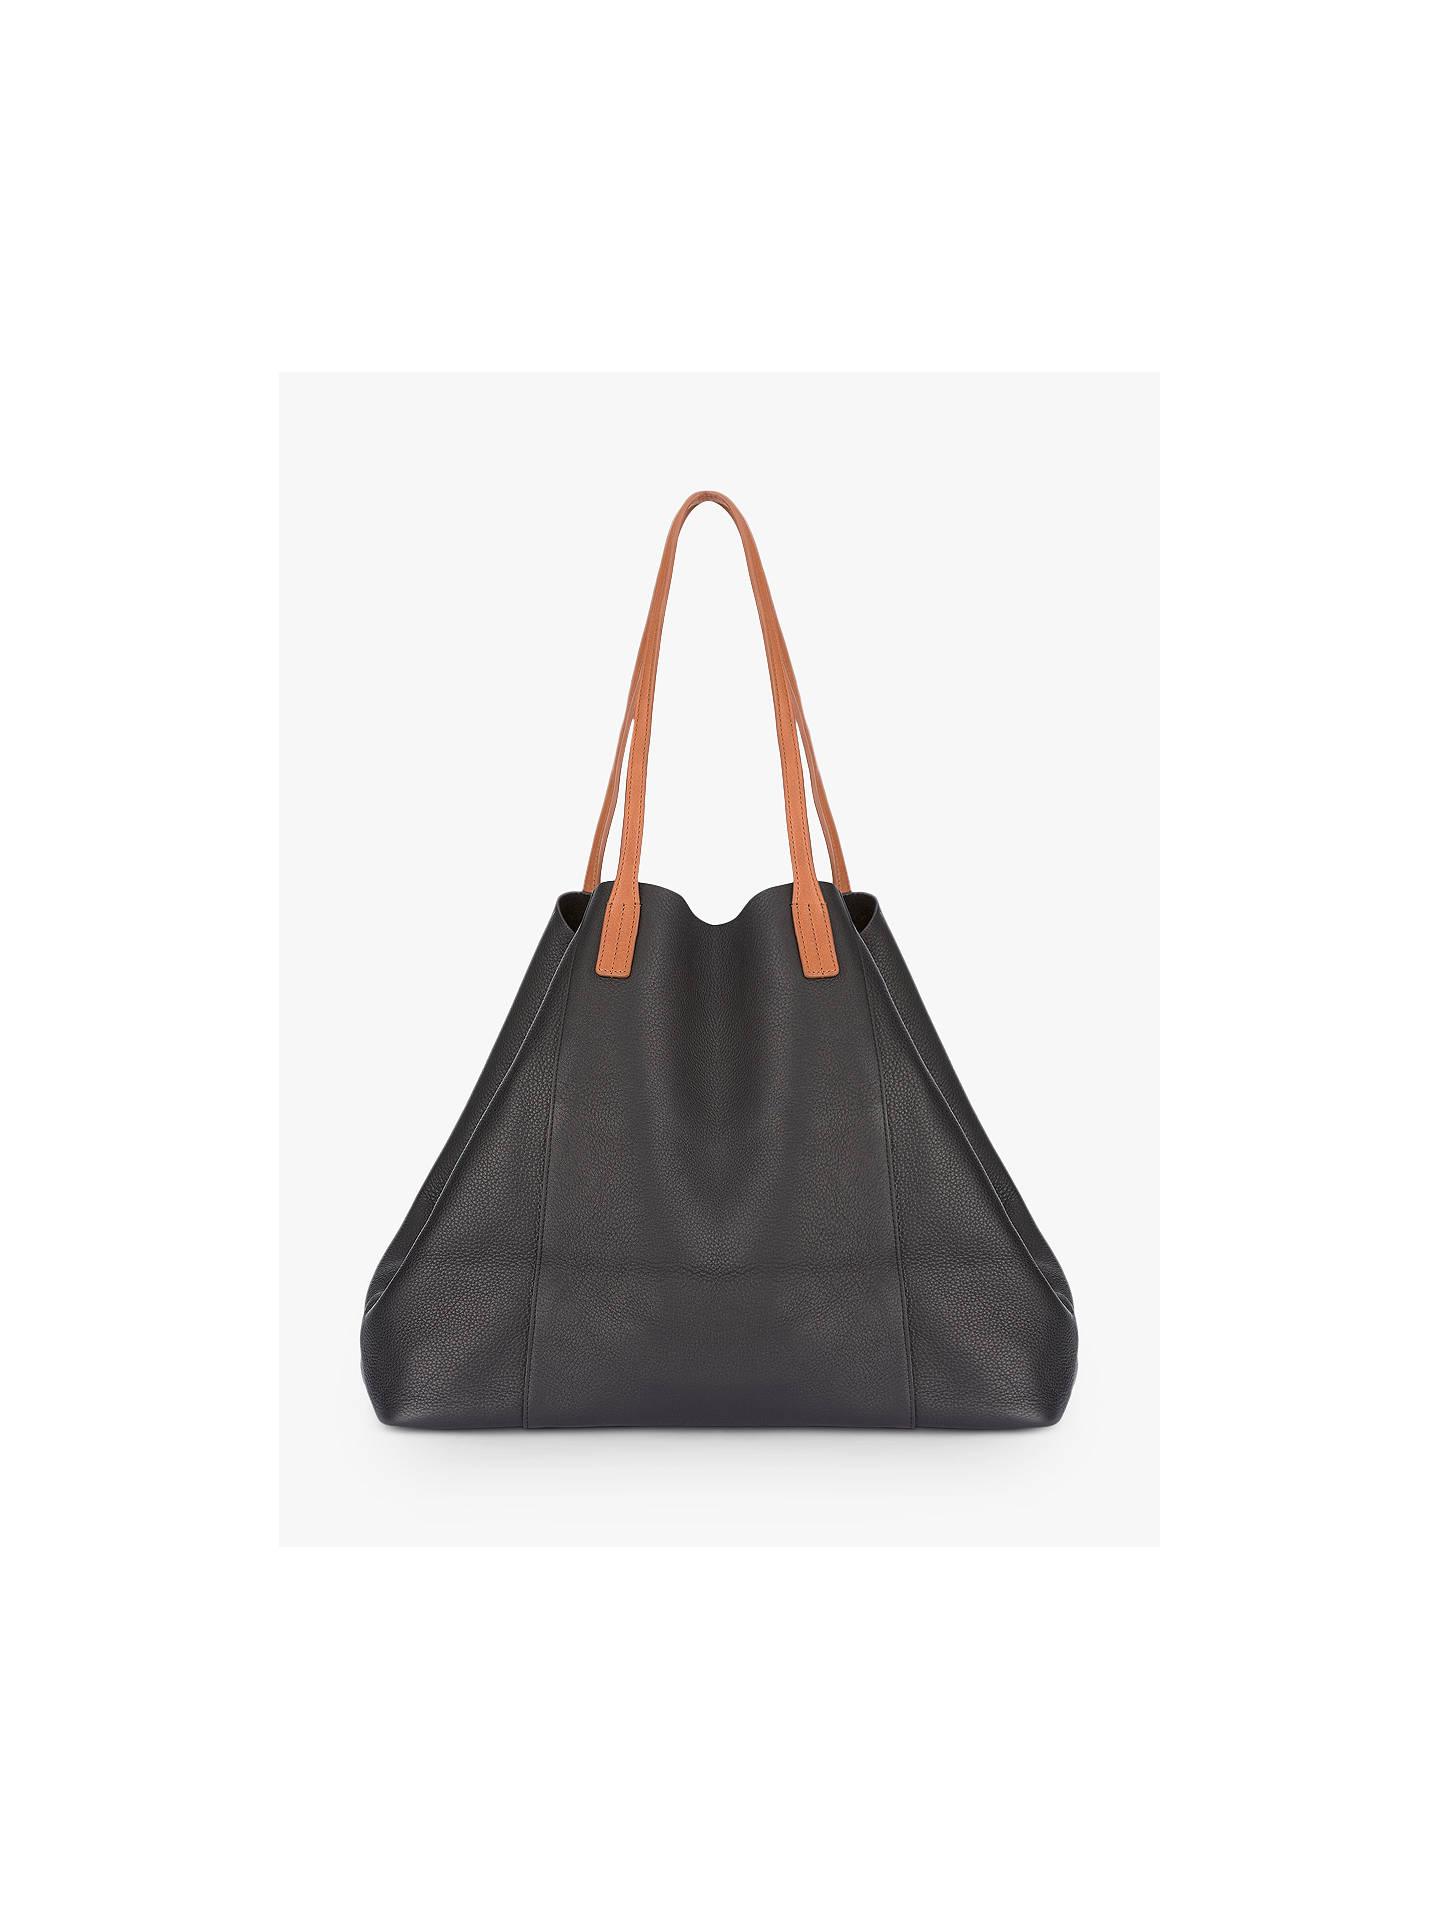 287d1be0 Buy Mint Velvet Liza Leather Oversized Tote Bag, Black Online at  johnlewis.com ...